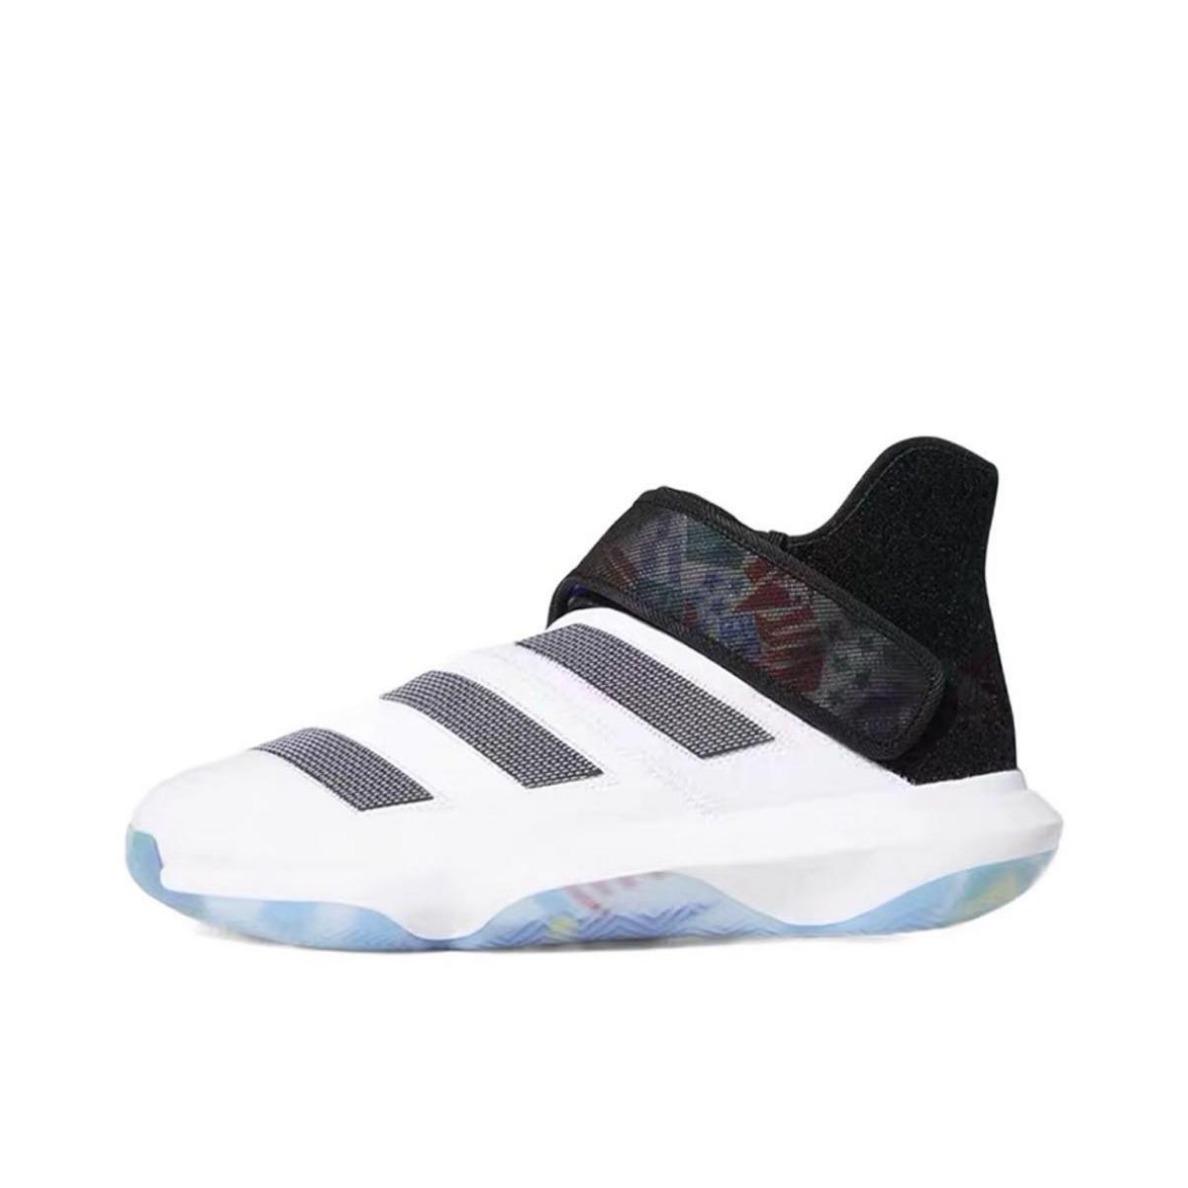 adidas 阿迪达斯 adidas Harden B/E 3 篮球鞋